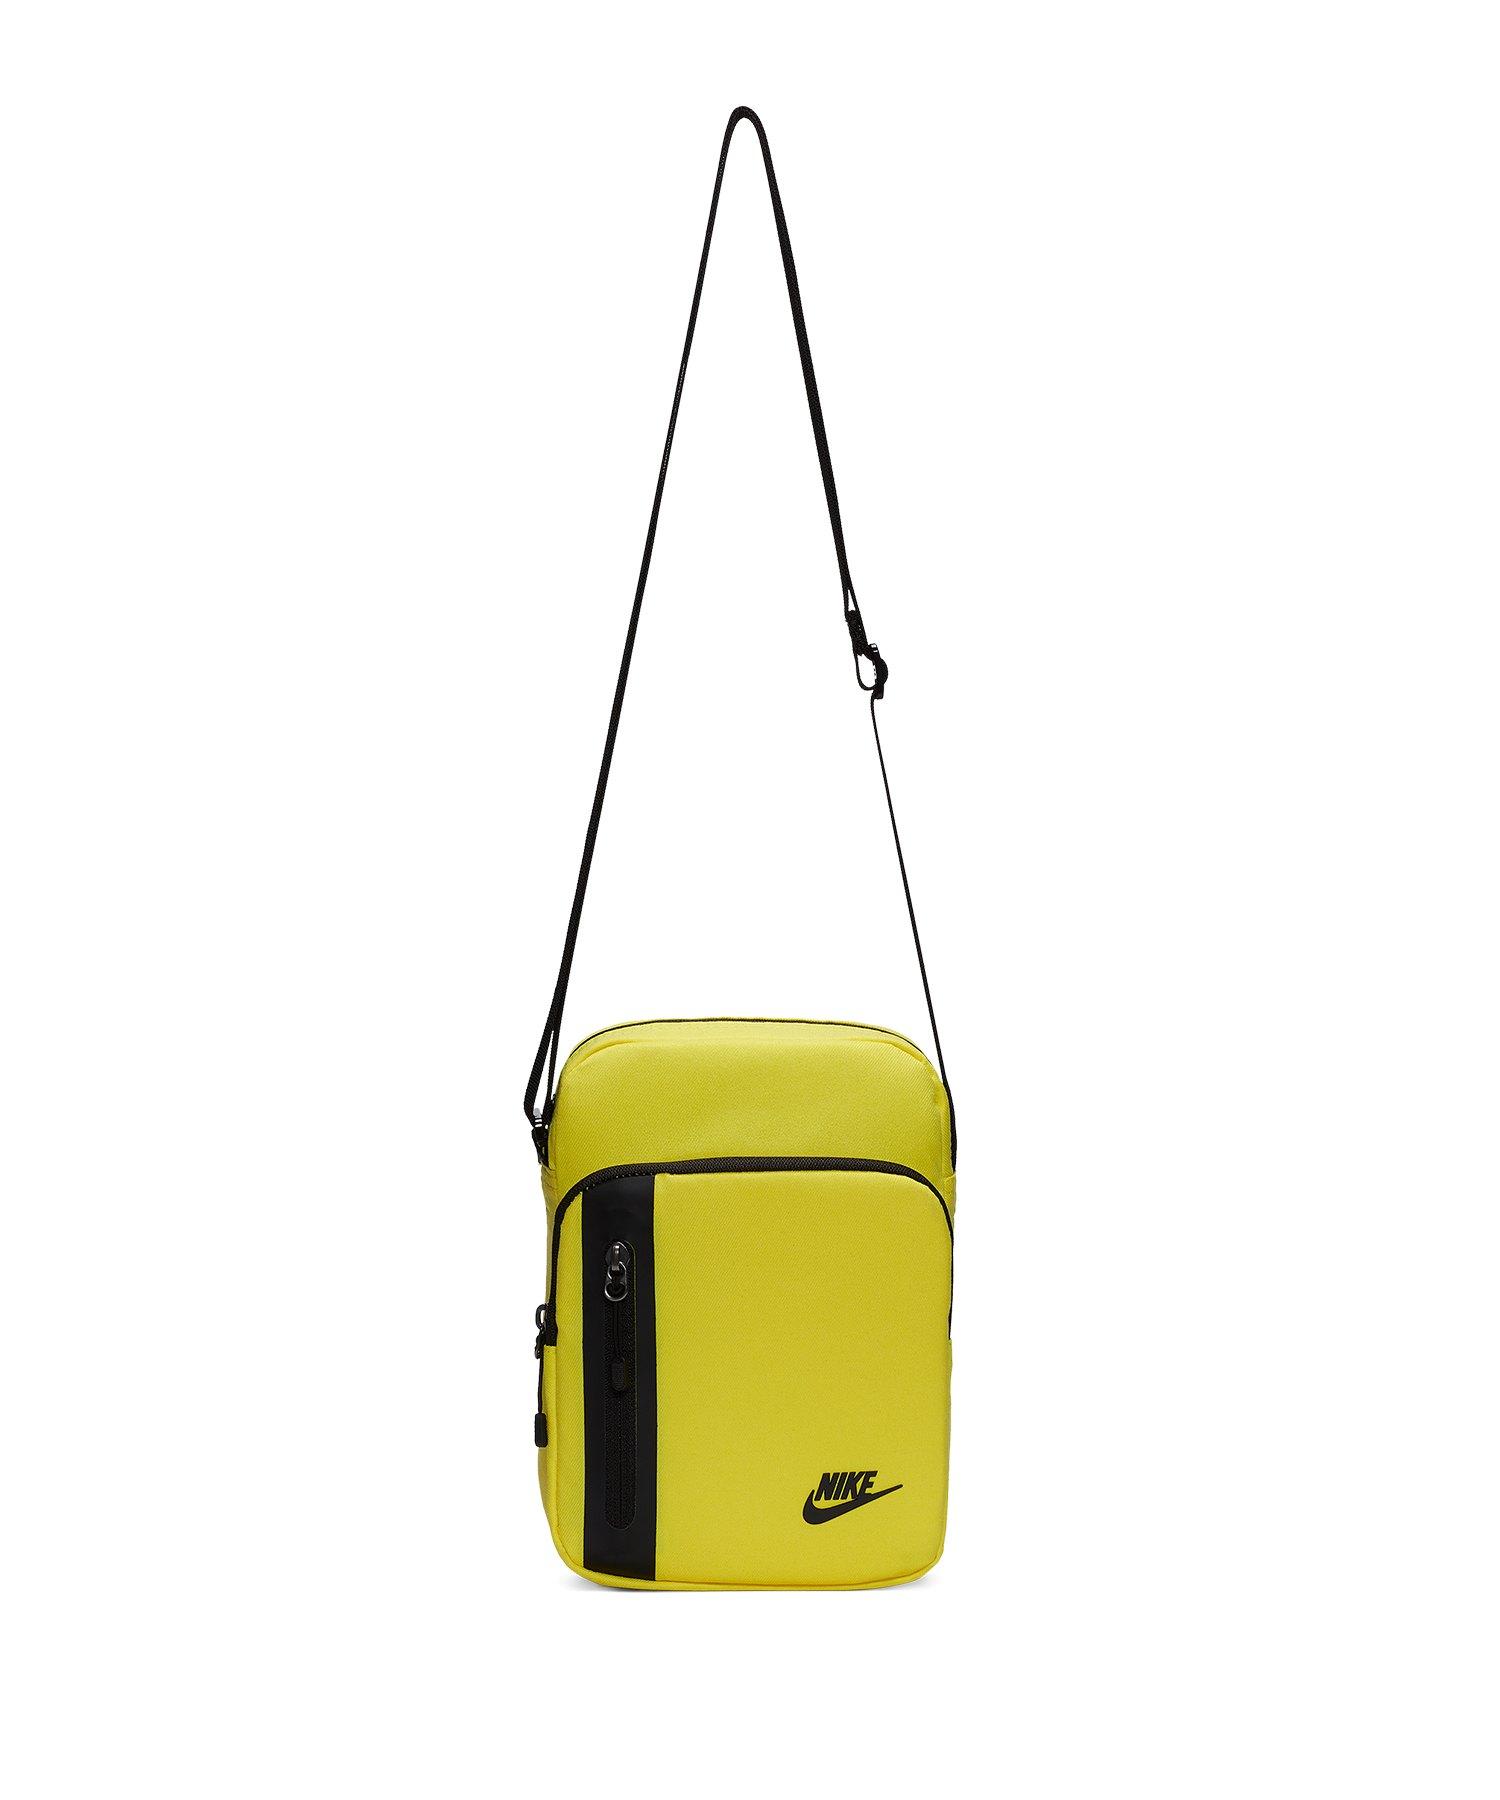 Nike Tech Small Items Bag Tasche Gelb F740 - gelb